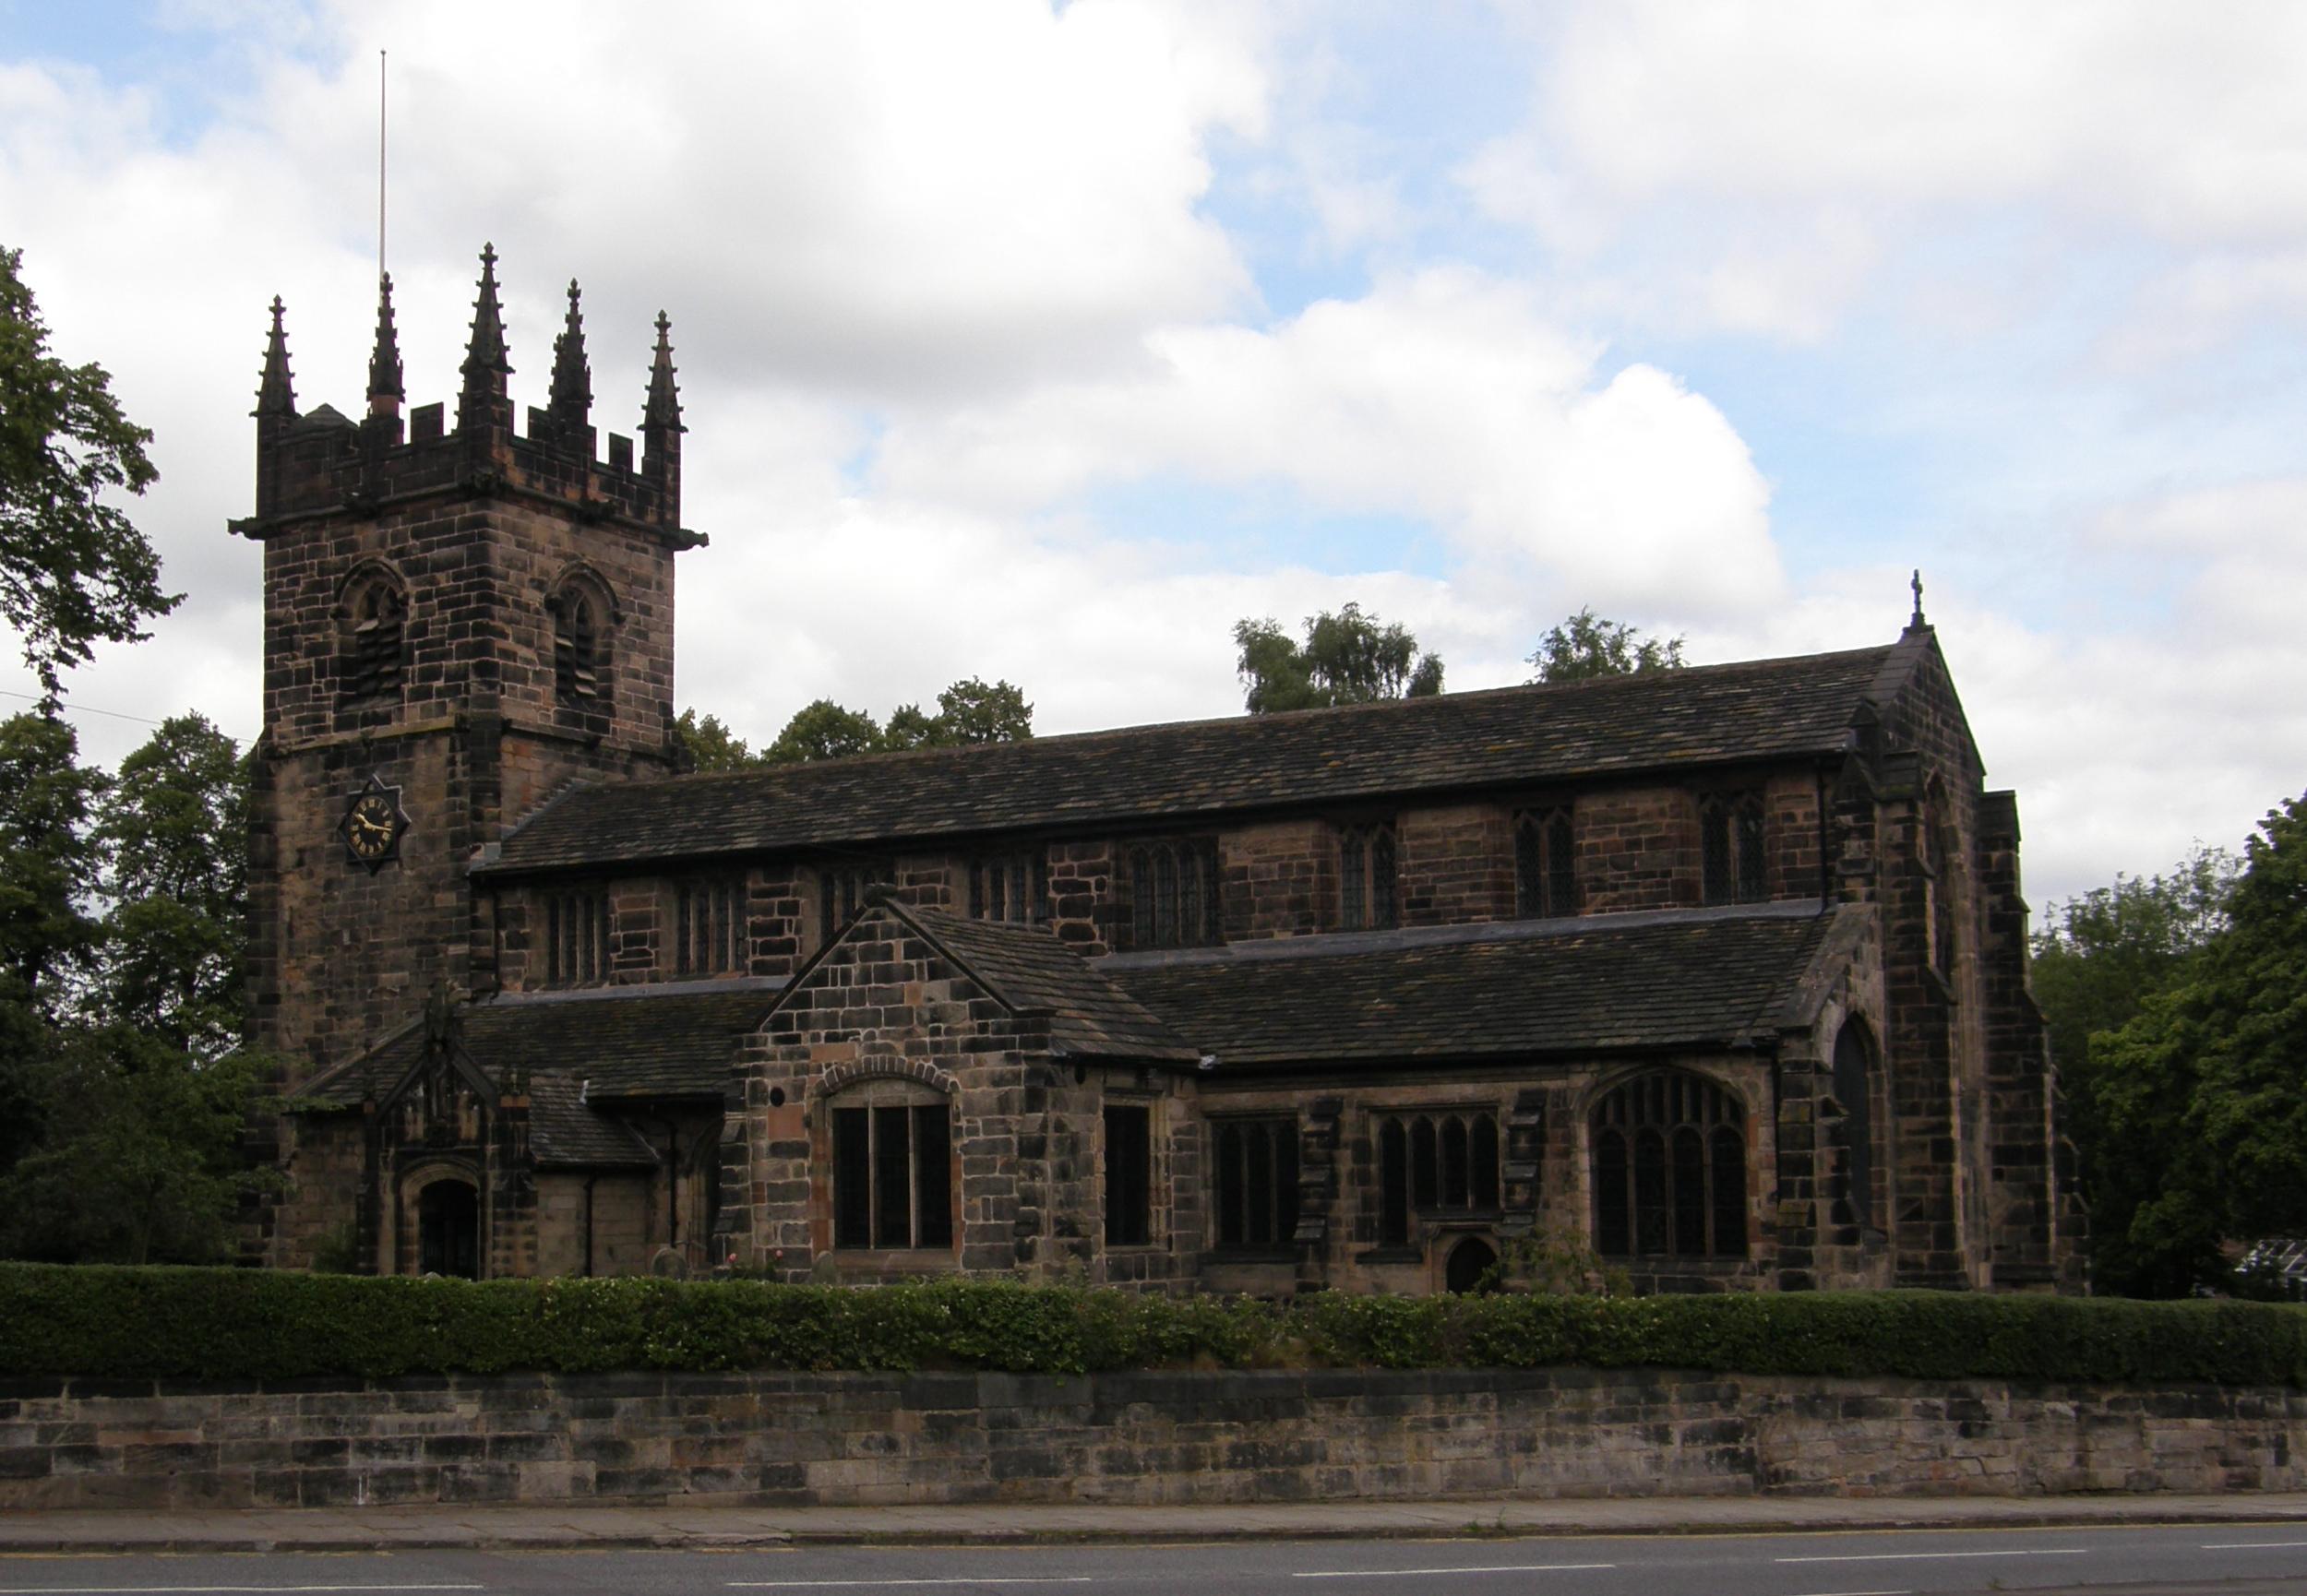 St. Bartholomew's, Wilmslow